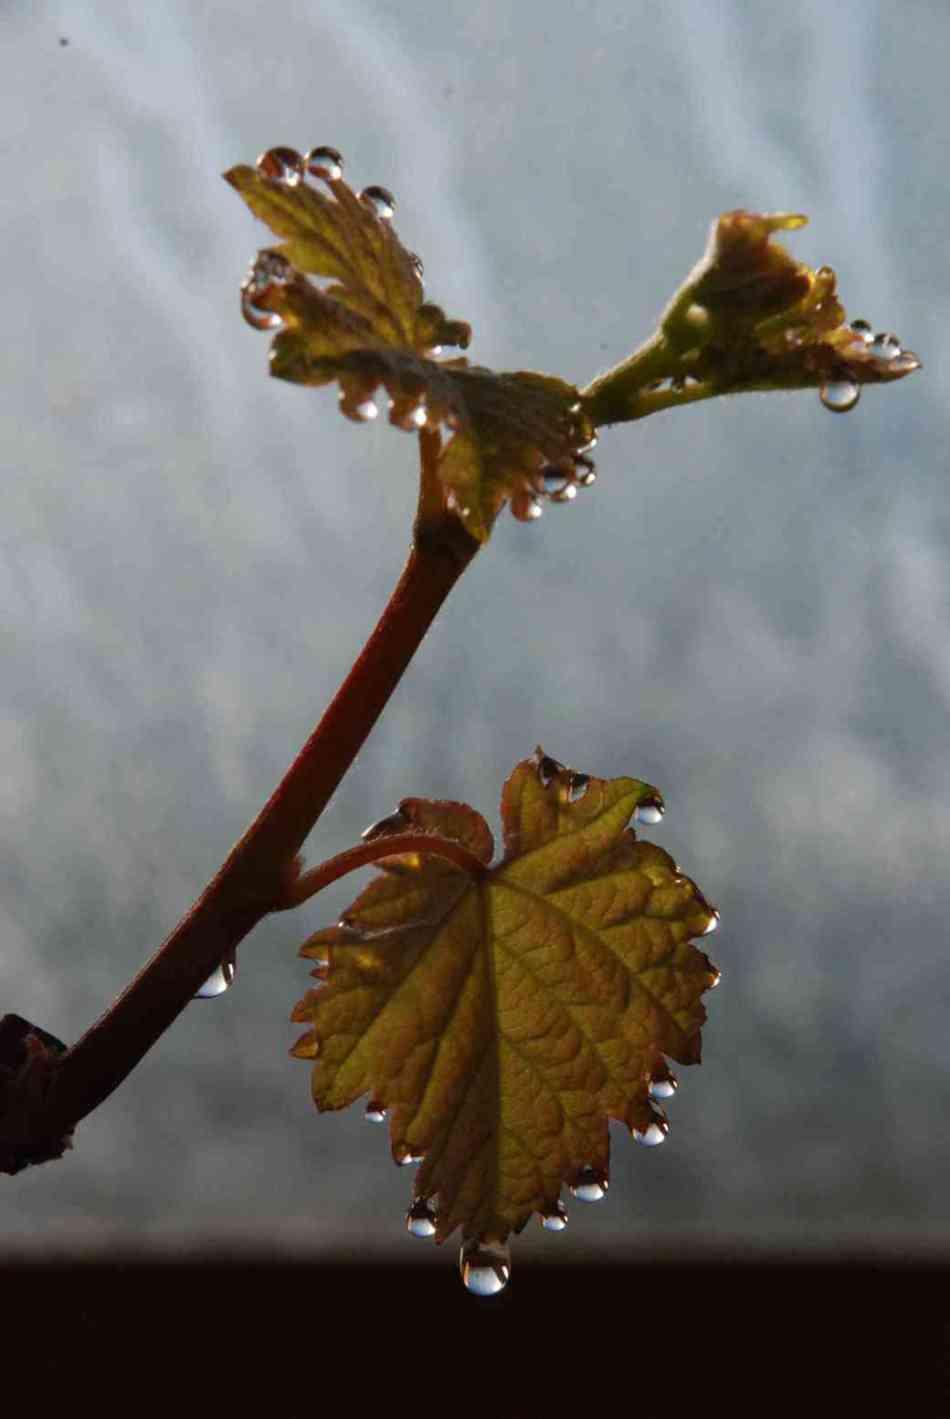 Guttation on grape leaves